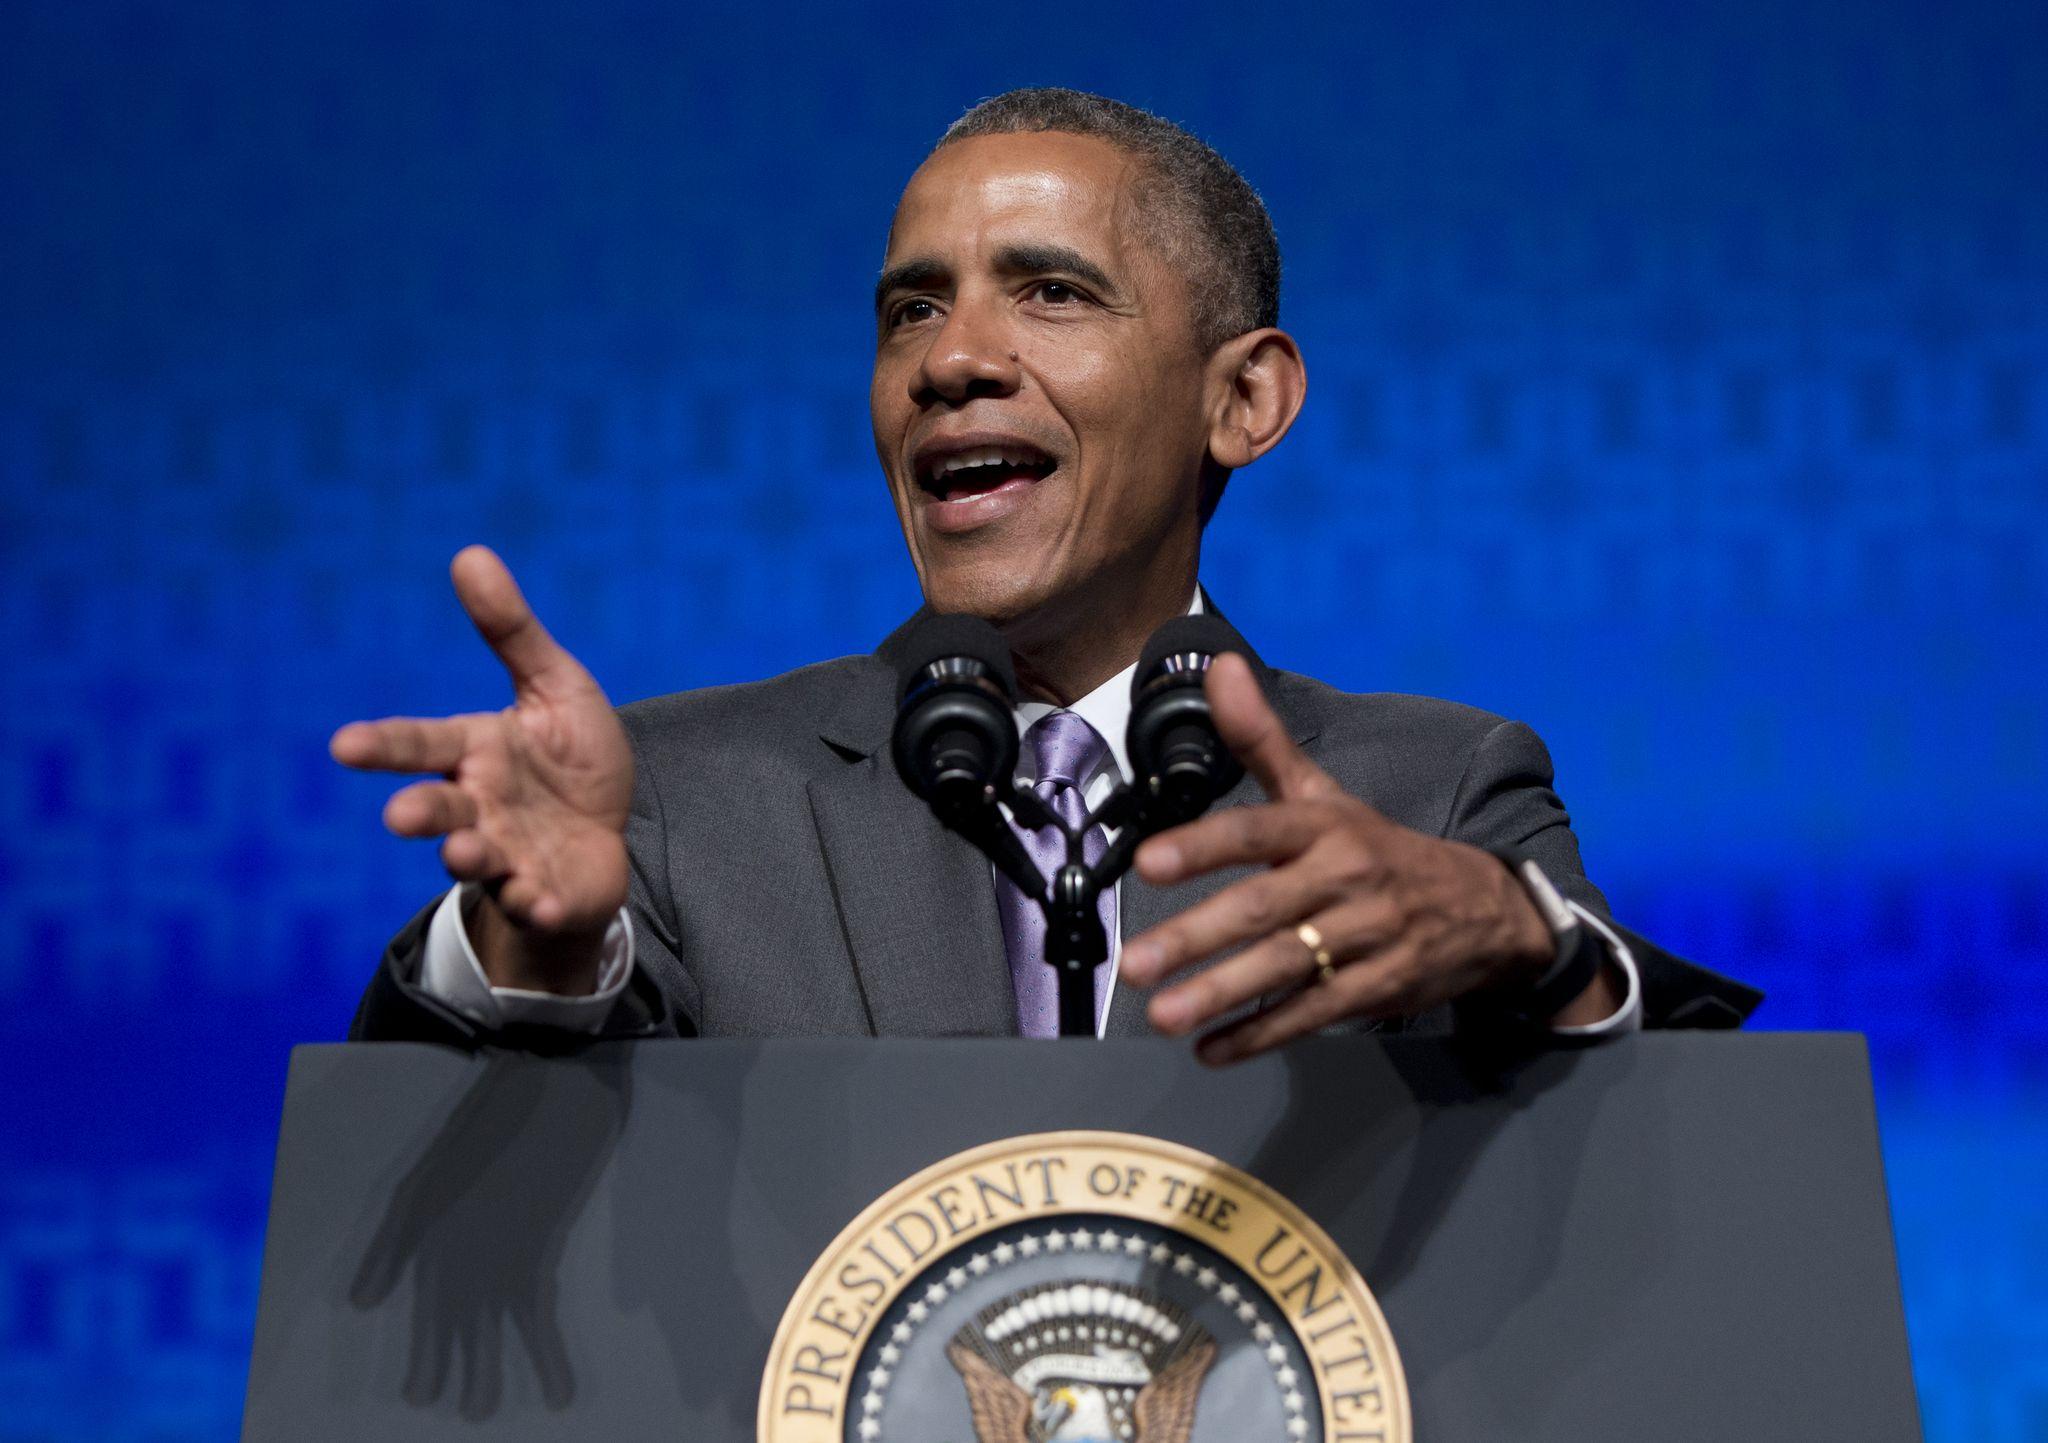 Obama's blatant disrespect for the Supreme Court